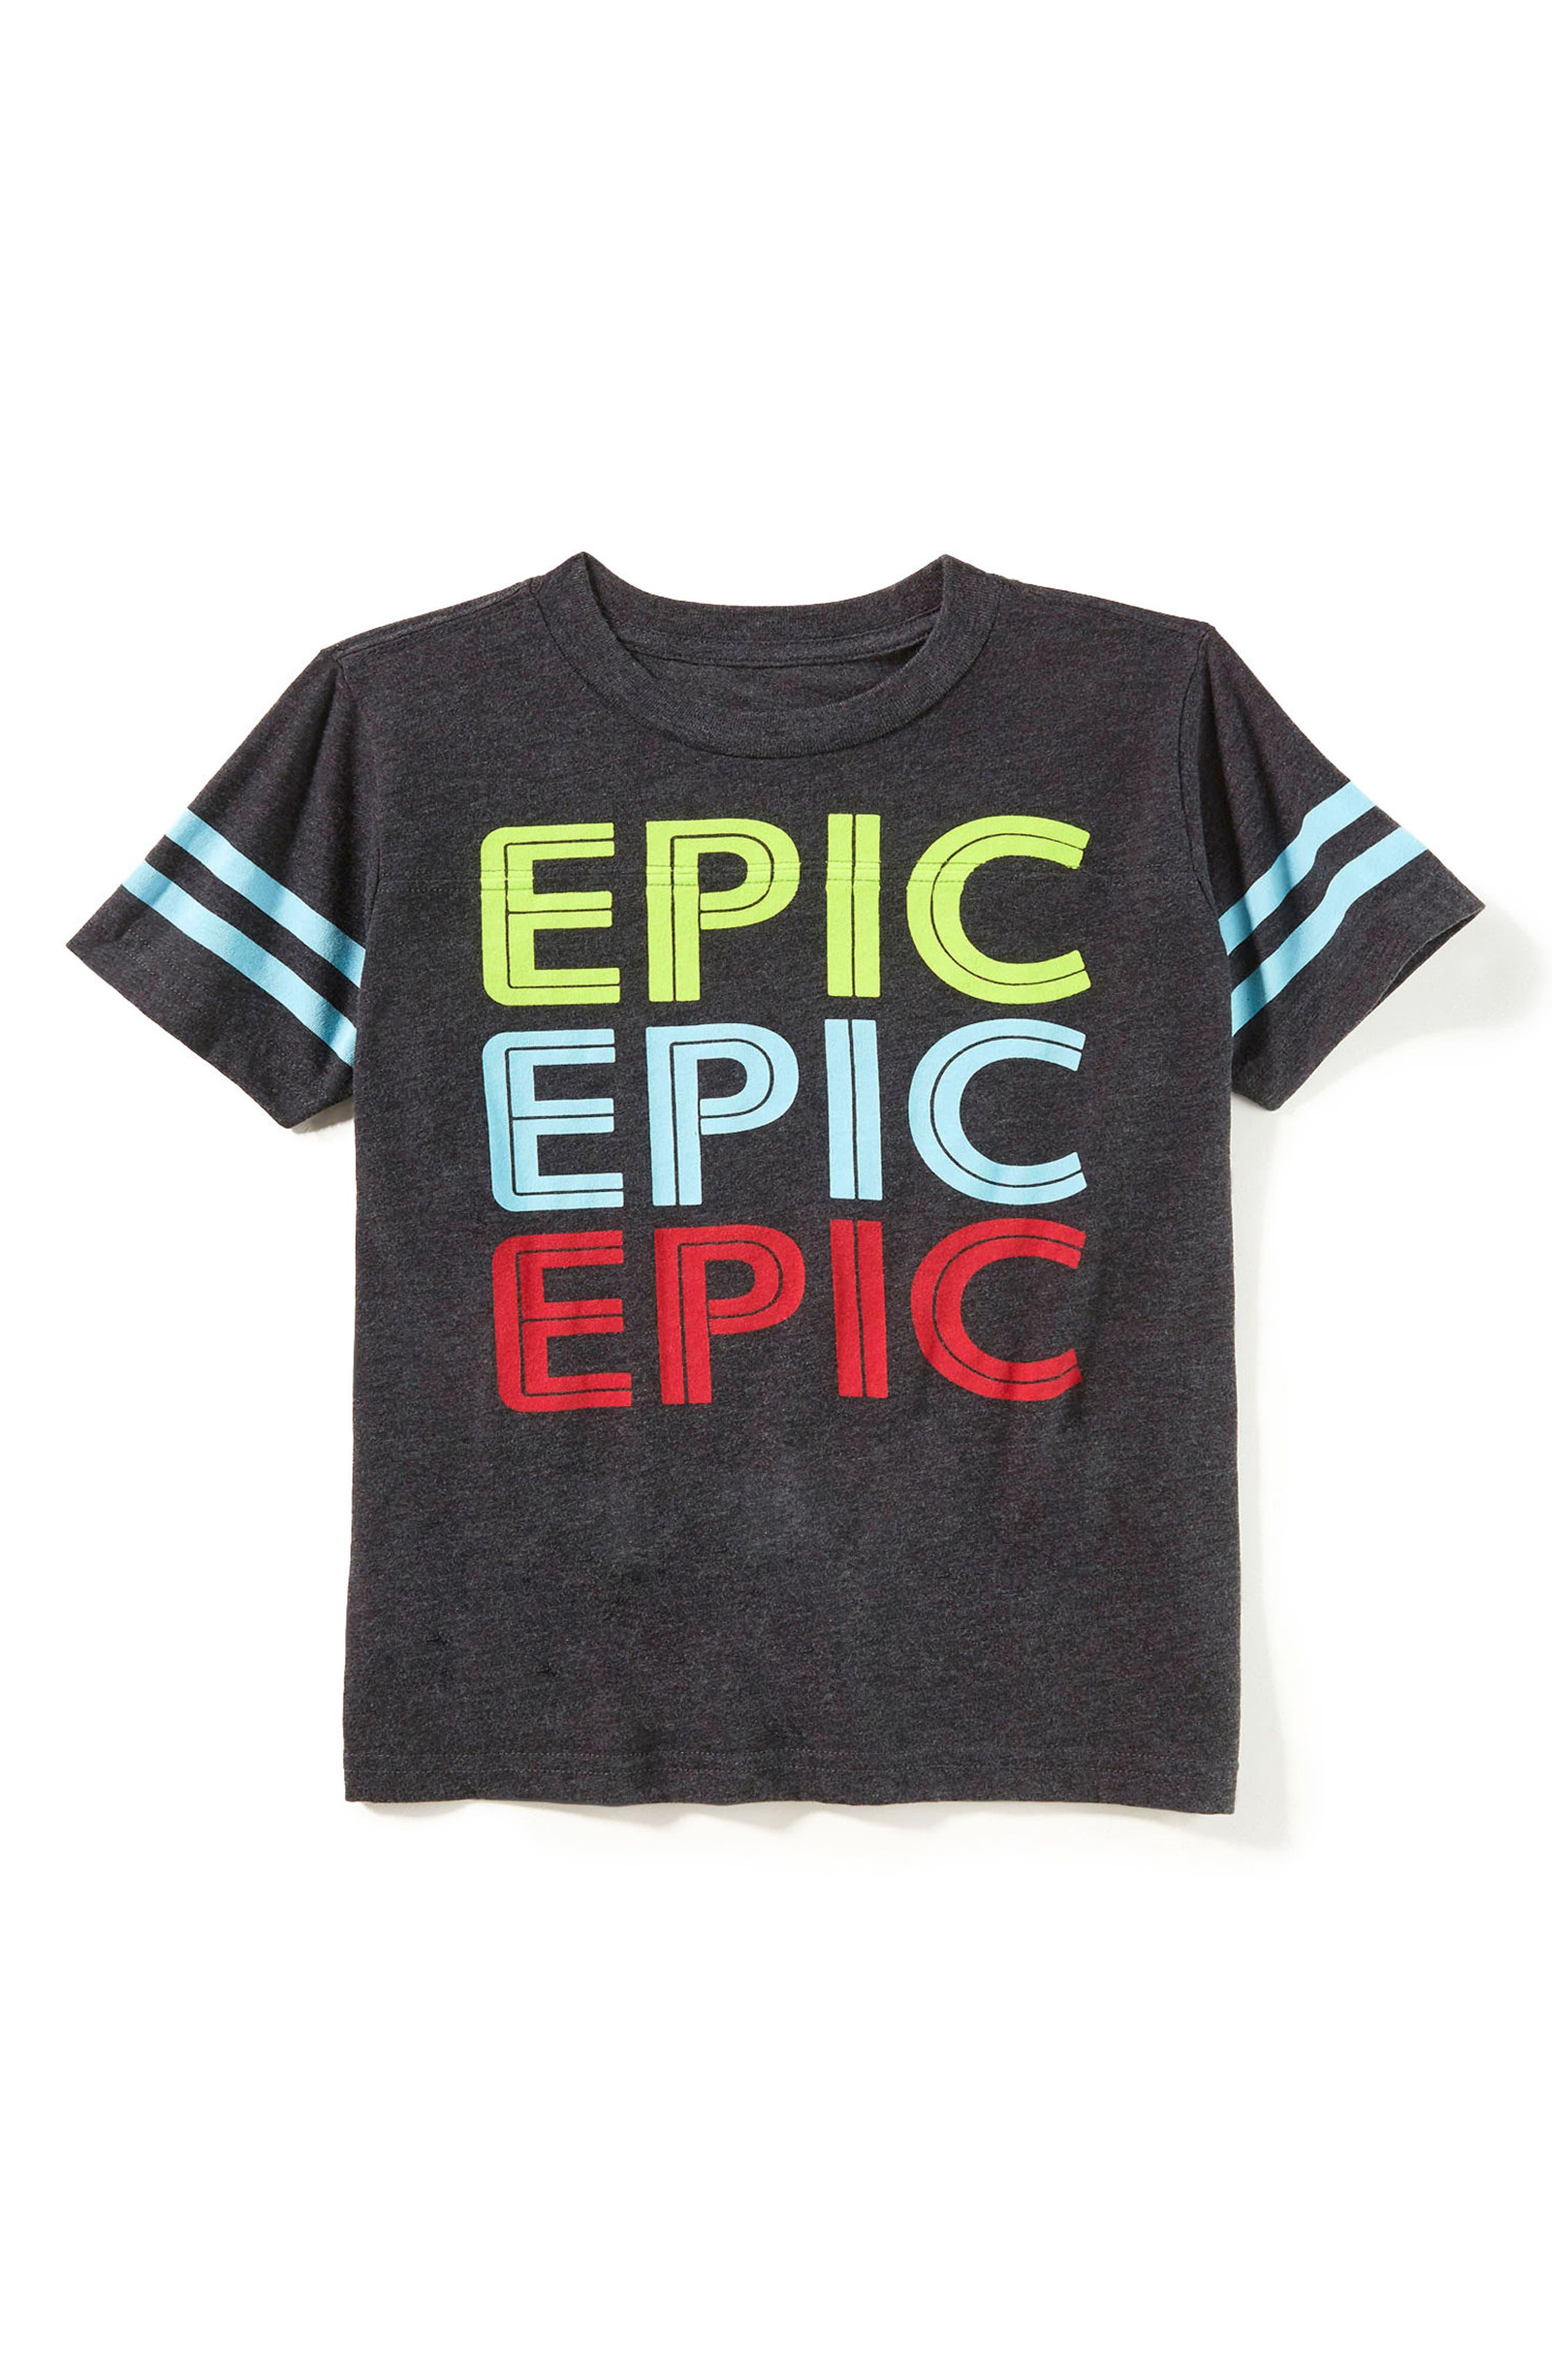 Main Image - Peek Epic Graphic T-Shirt (Toddler Boys, Little Boys & Big Boys)